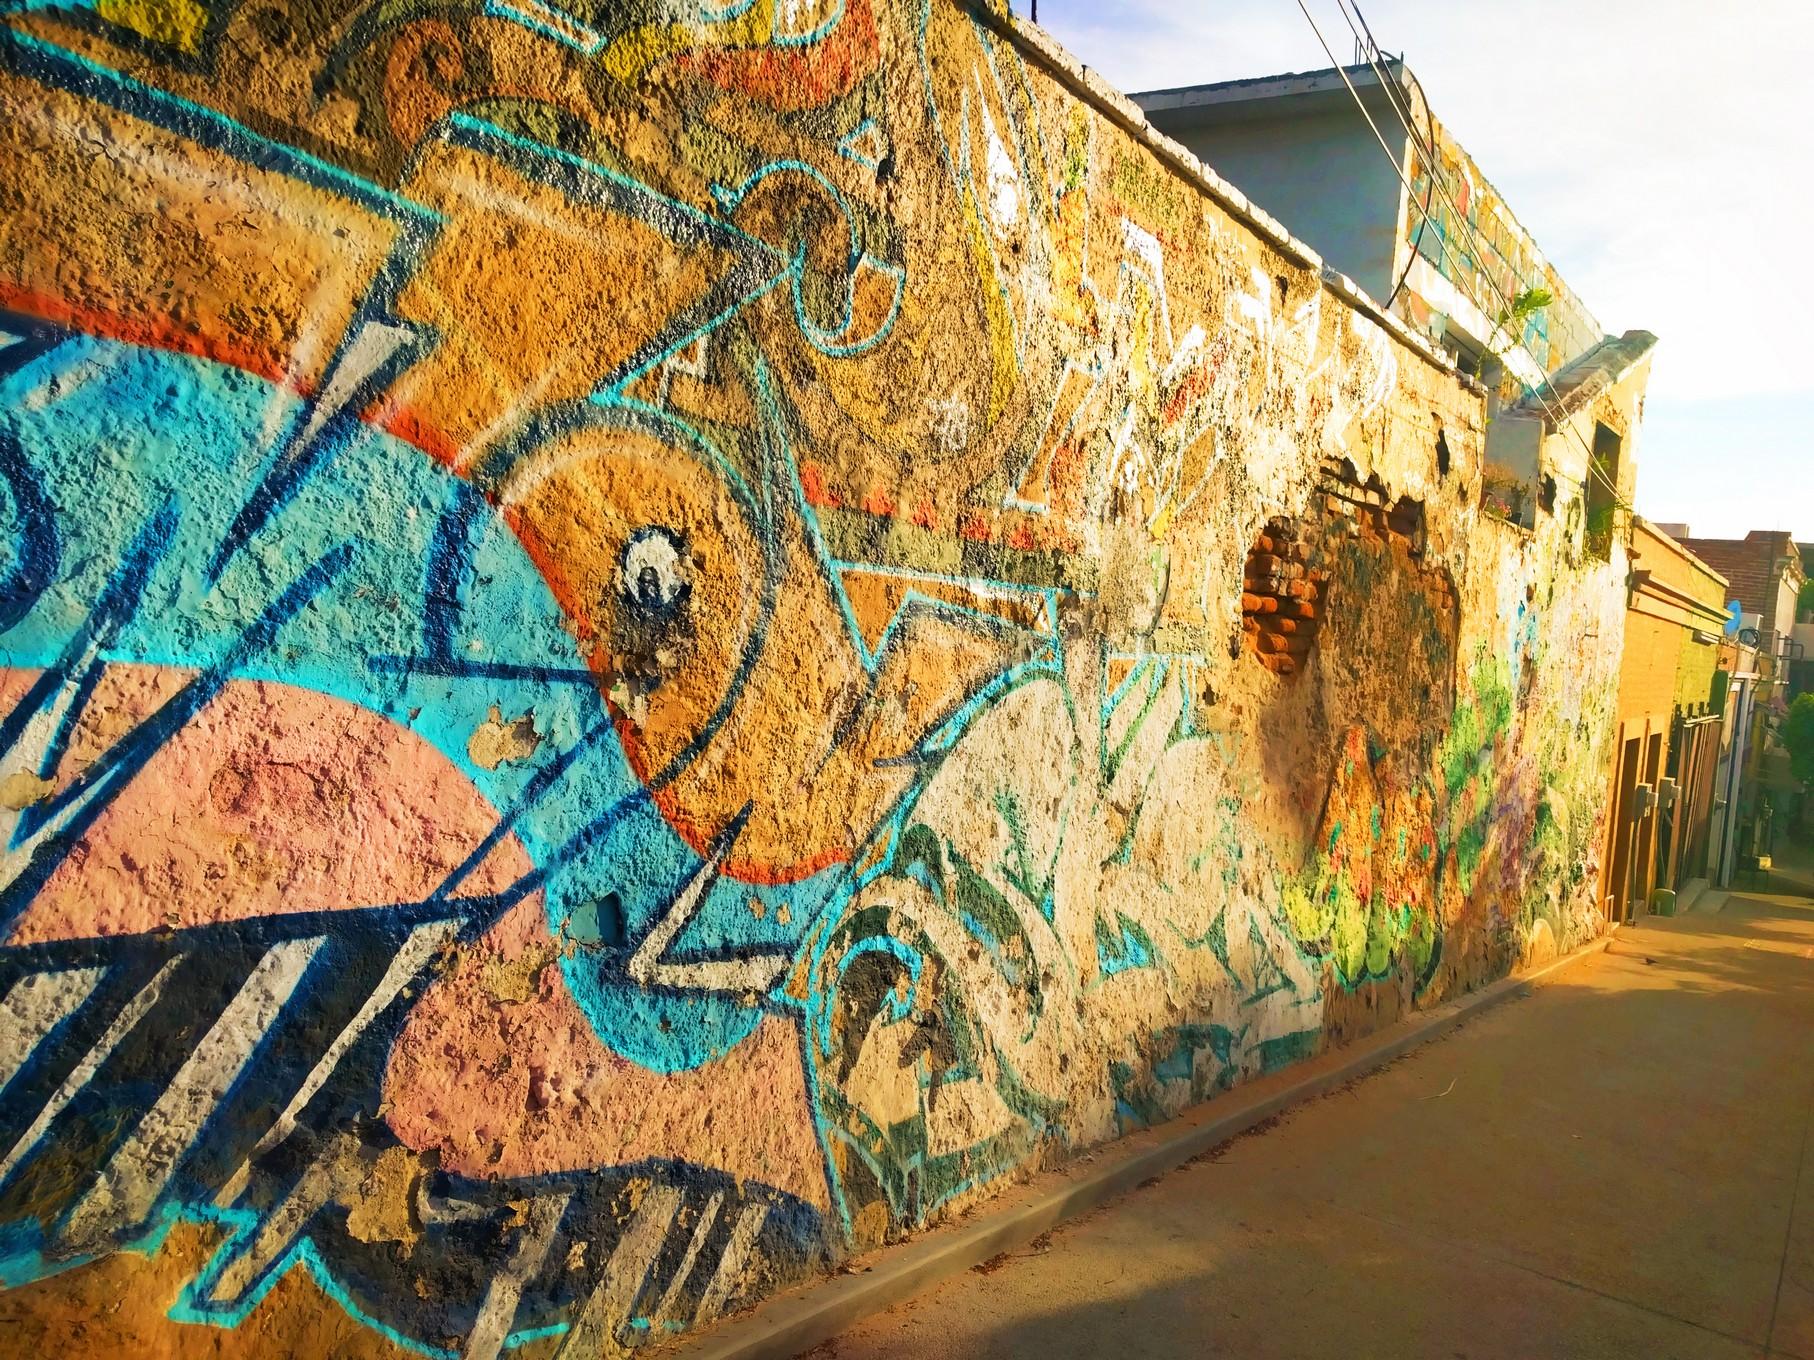 street-art-in-la-paz-bcs-mexico-1 - 2 Travel Dads